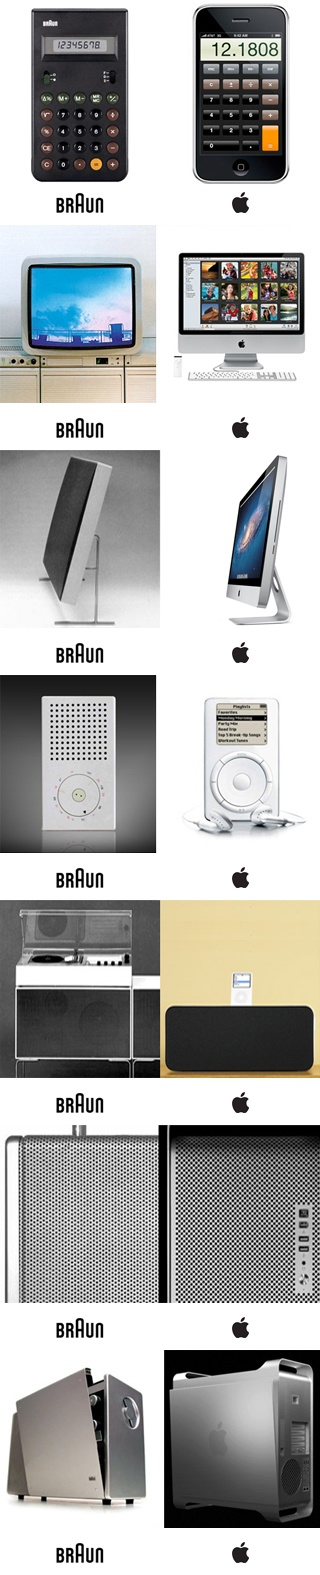 BRAUN > Apple